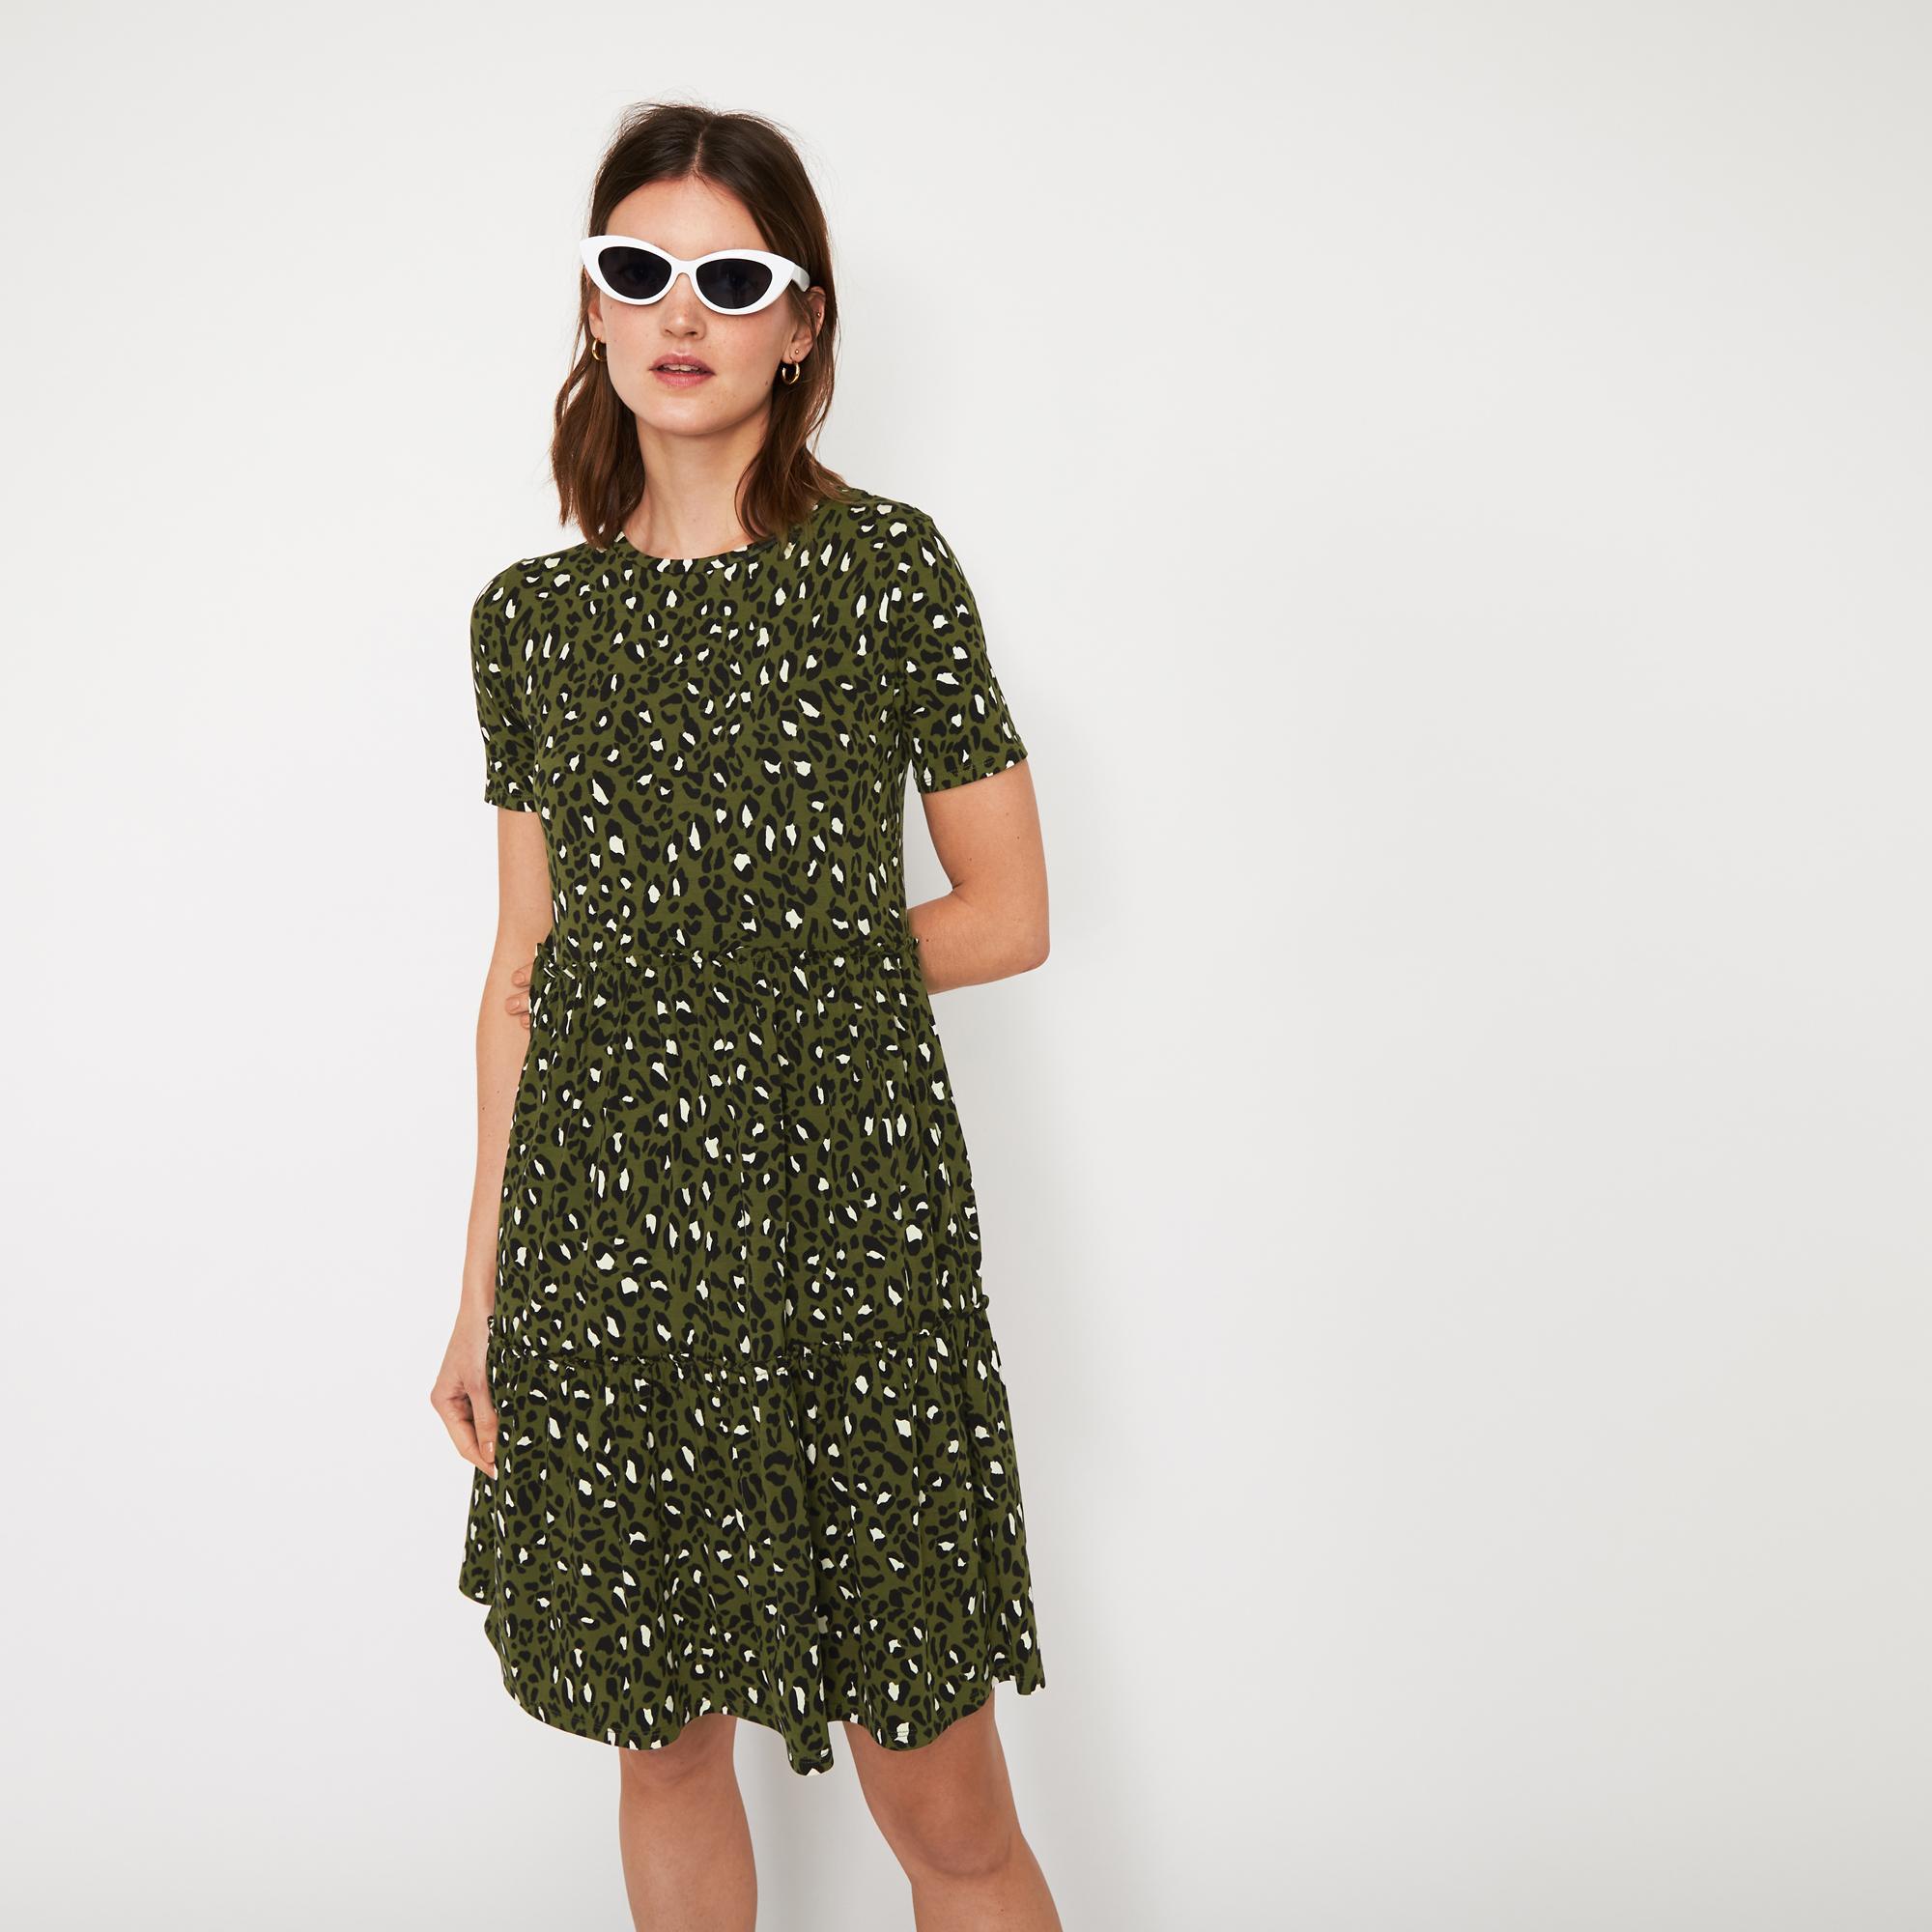 3991dac931a0 Warehouse Leopard Print T-shirt Dress in Green - Lyst